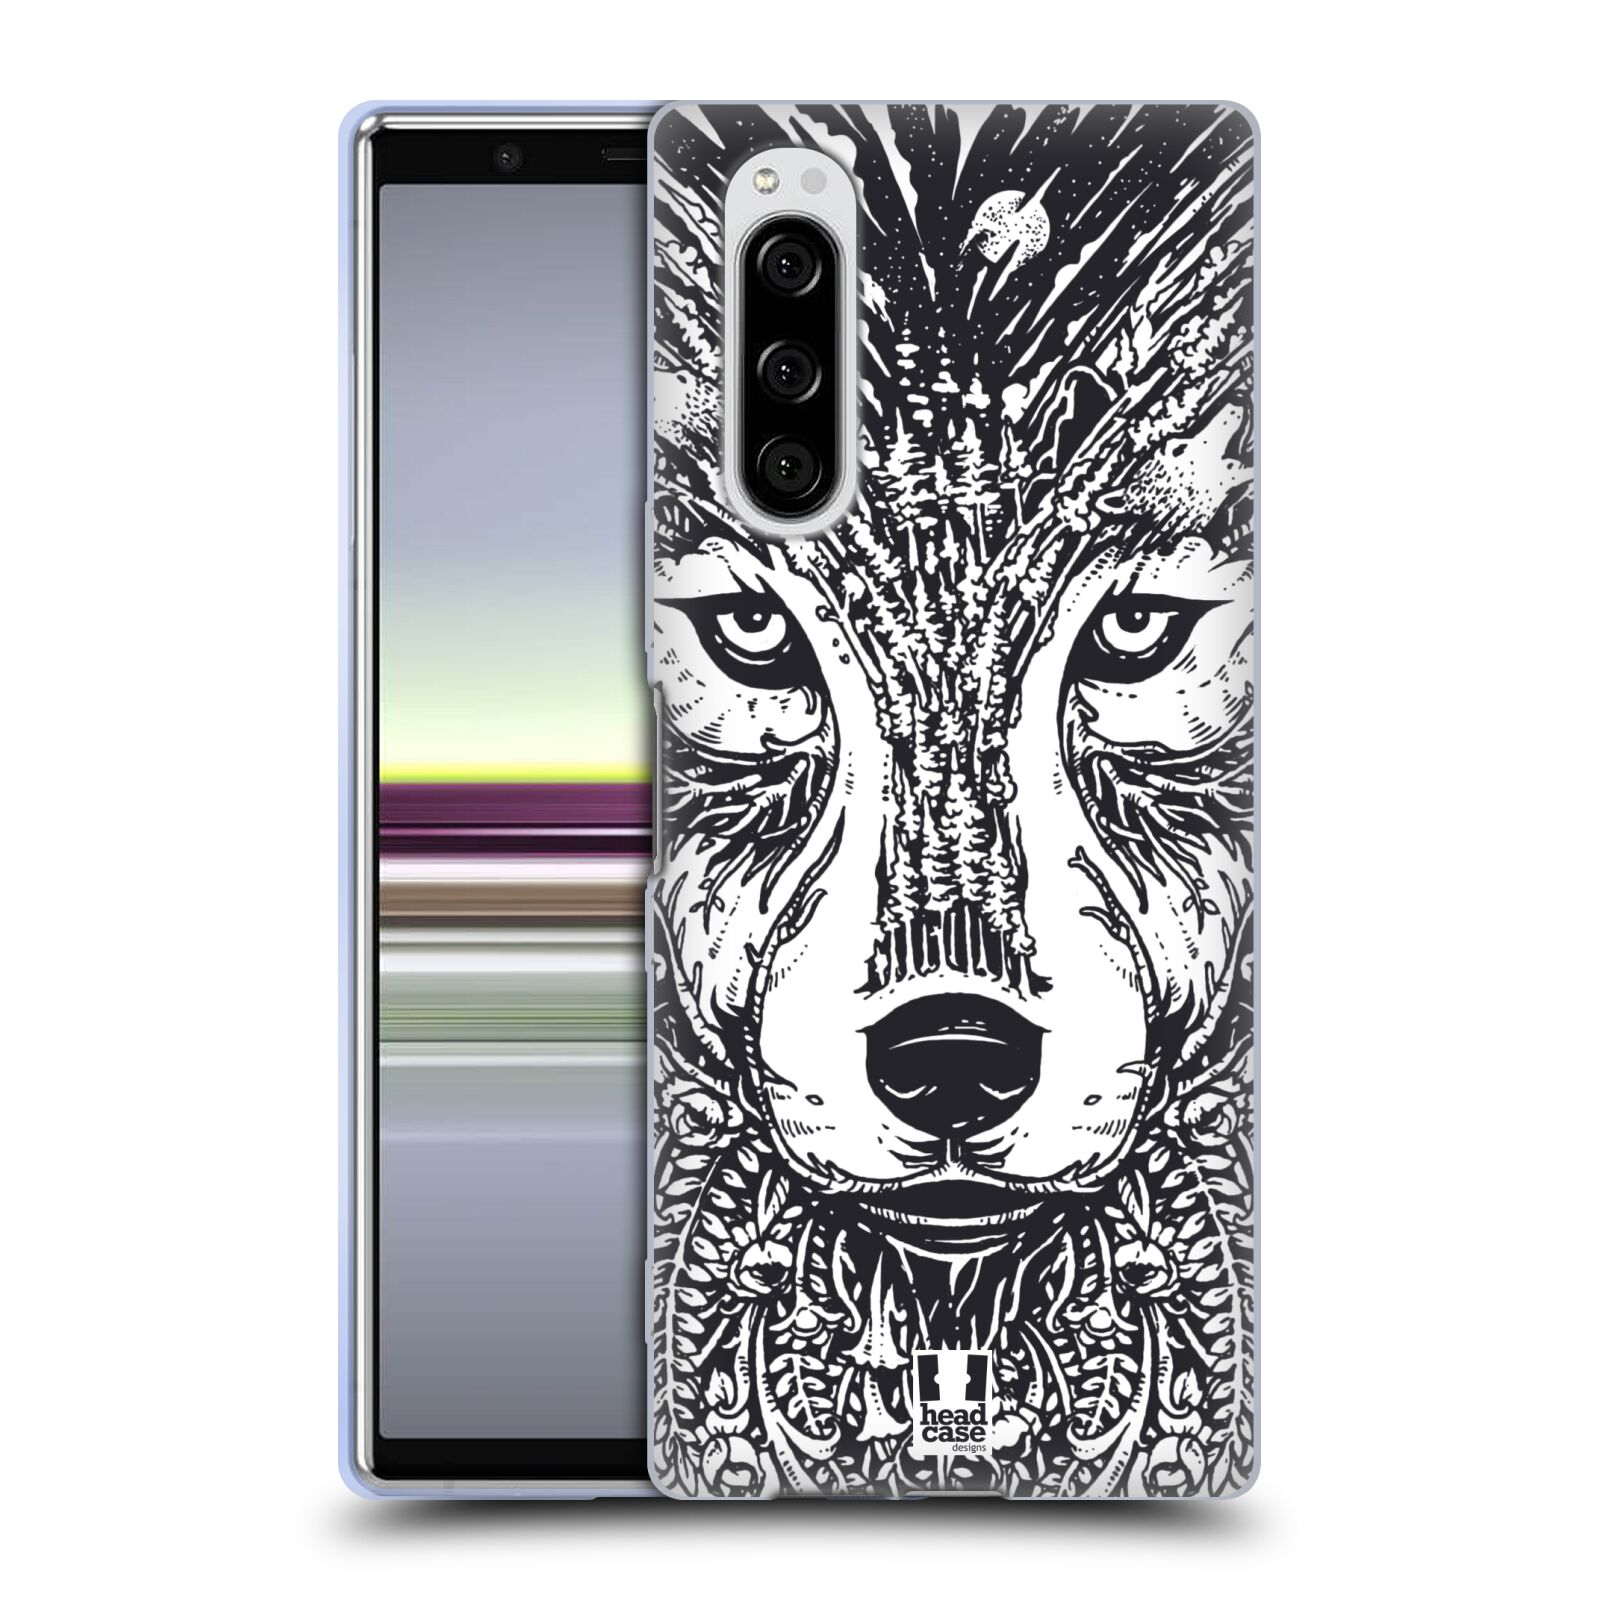 Silikonové pouzdro na mobil Sony Xperia 5 - Head Case - DOODLE TVÁŘ VLK